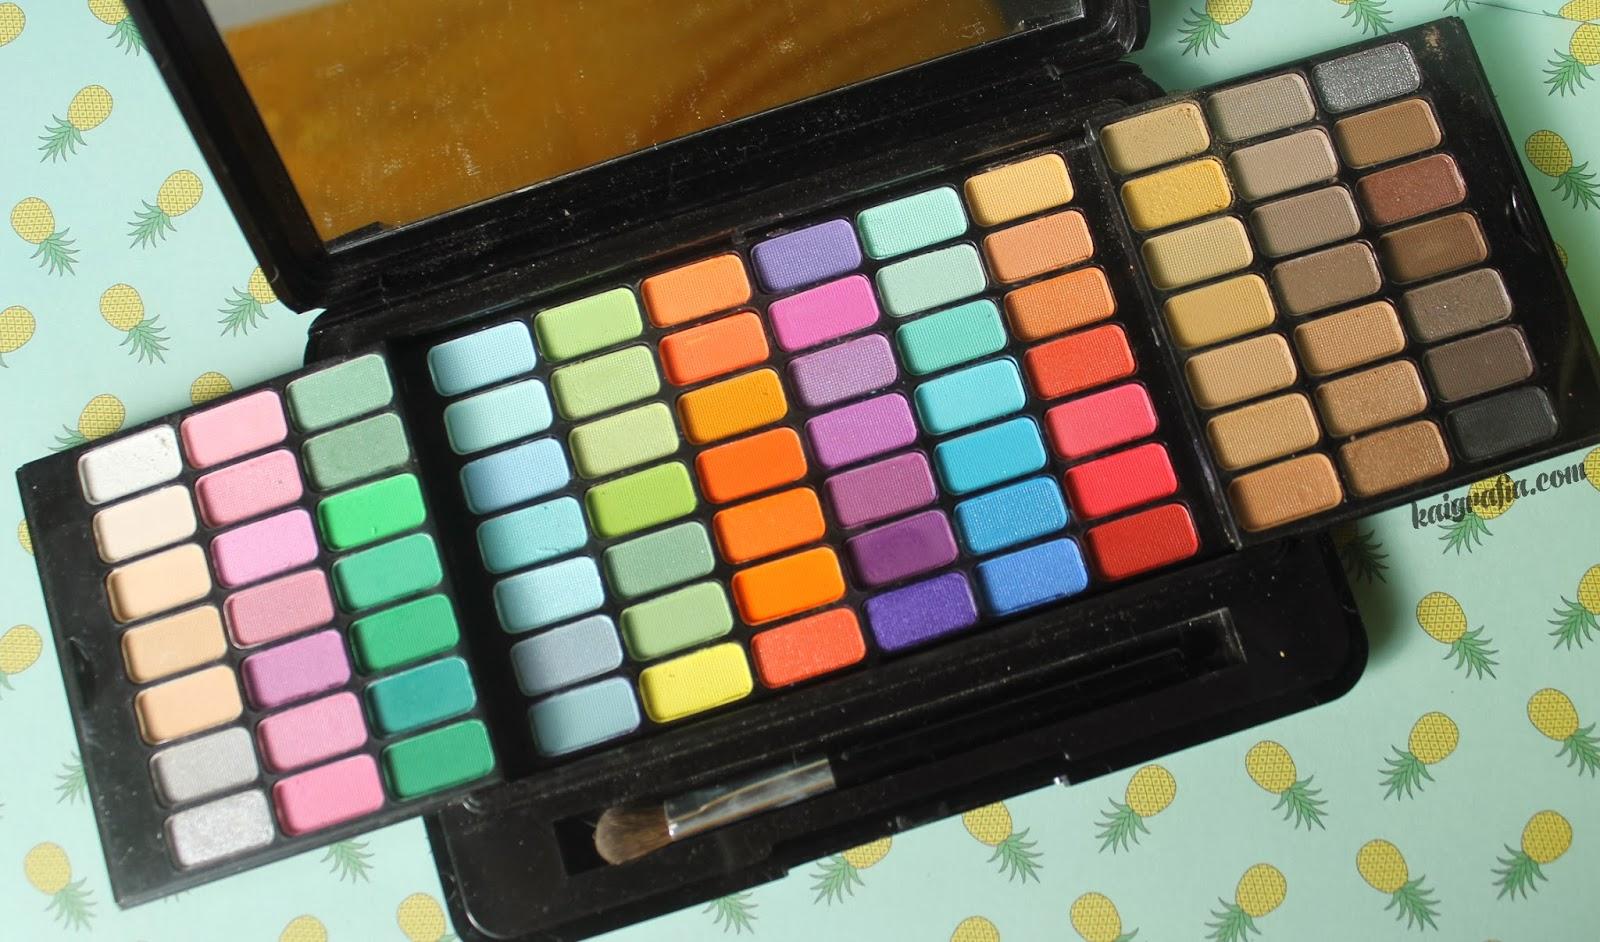 PROPS 88 eyeshadow palette